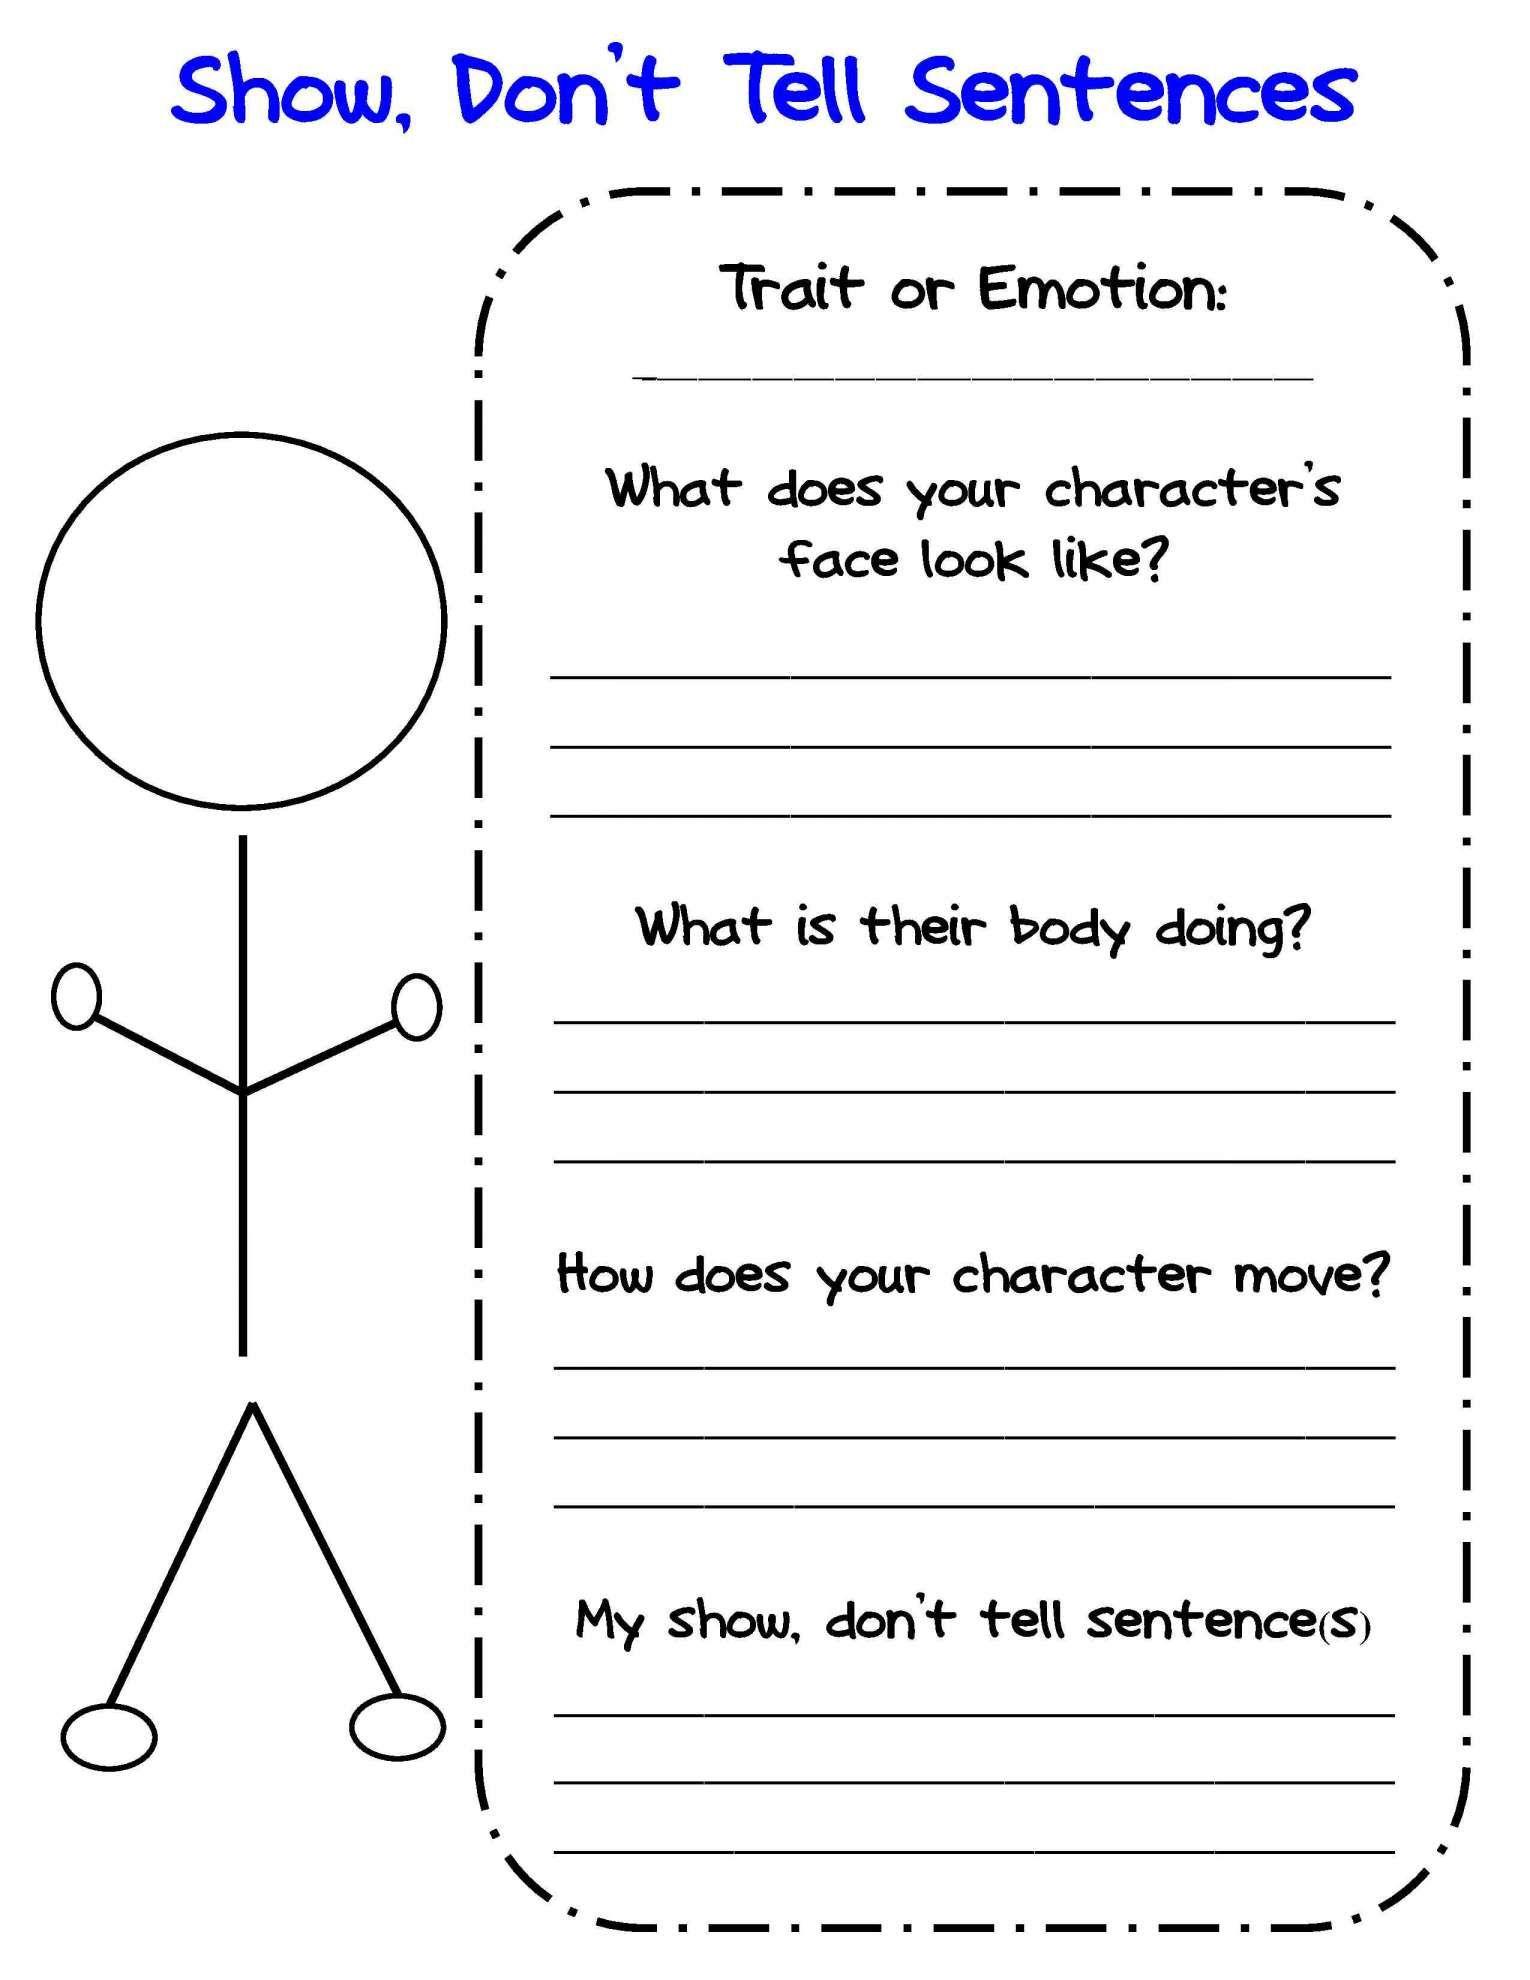 11 2nd Grade Personal Narrative Worksheet Personalnarrativeworksh Personal Narrative Graphic Organizer Descriptive Writing Writing Worksheets